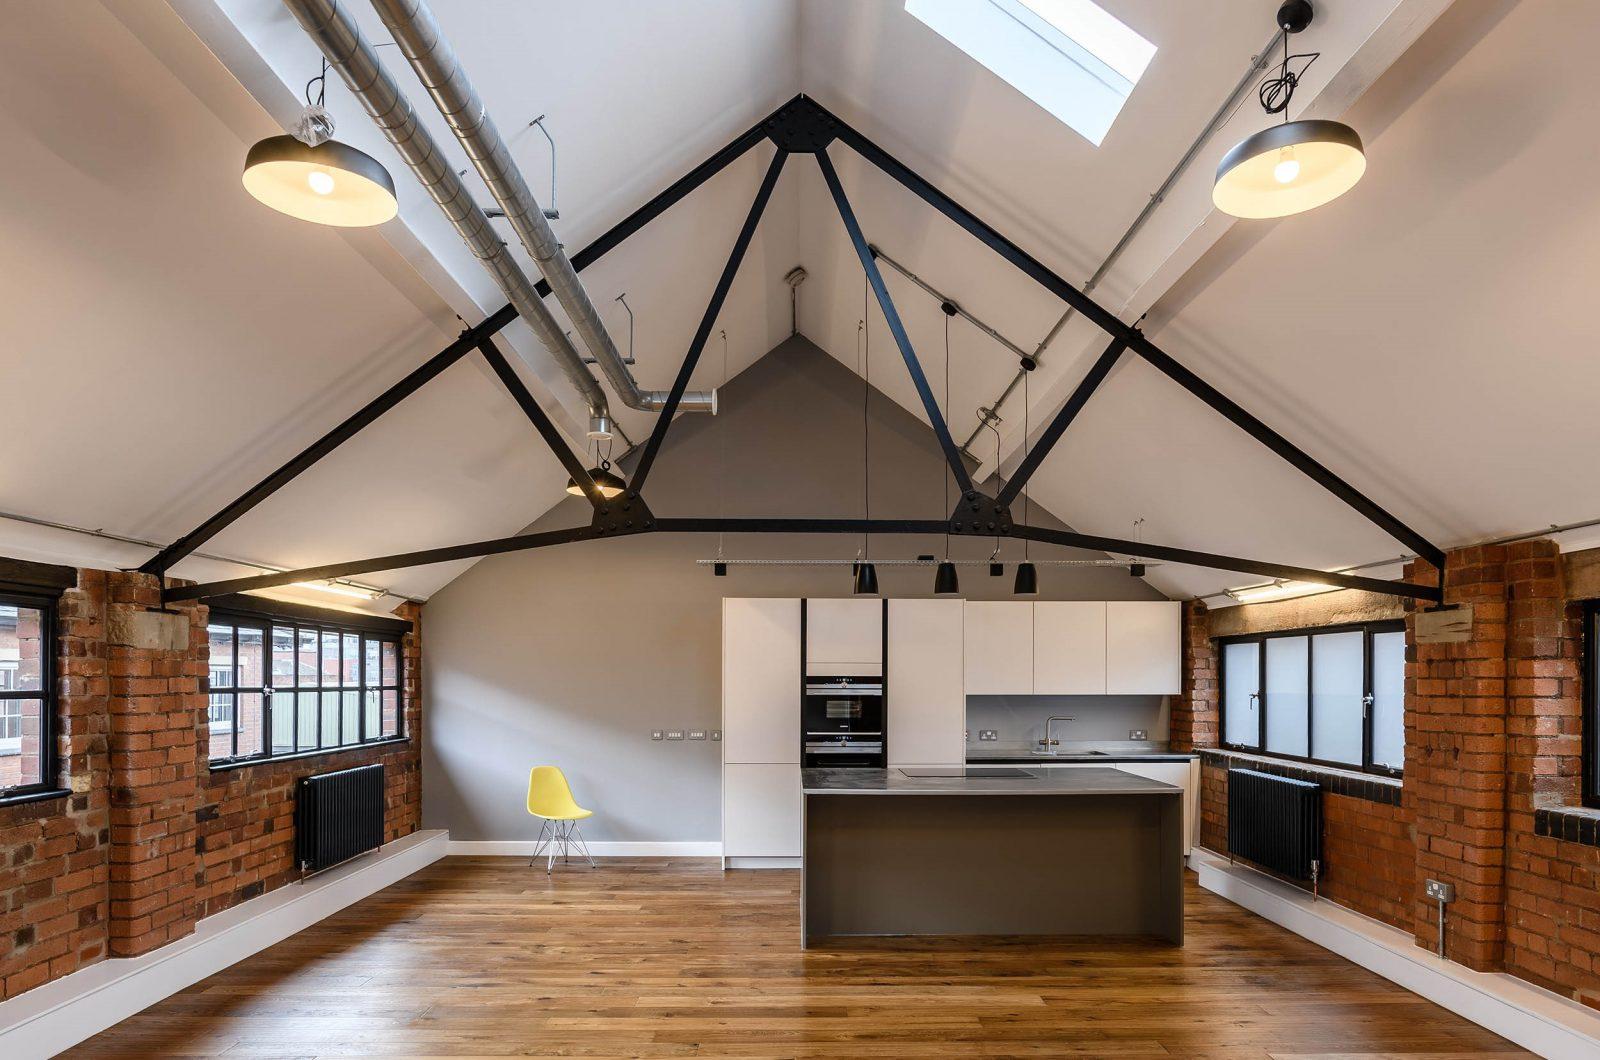 LIV Projekt open plan modern white kitchen with exposed brick walls